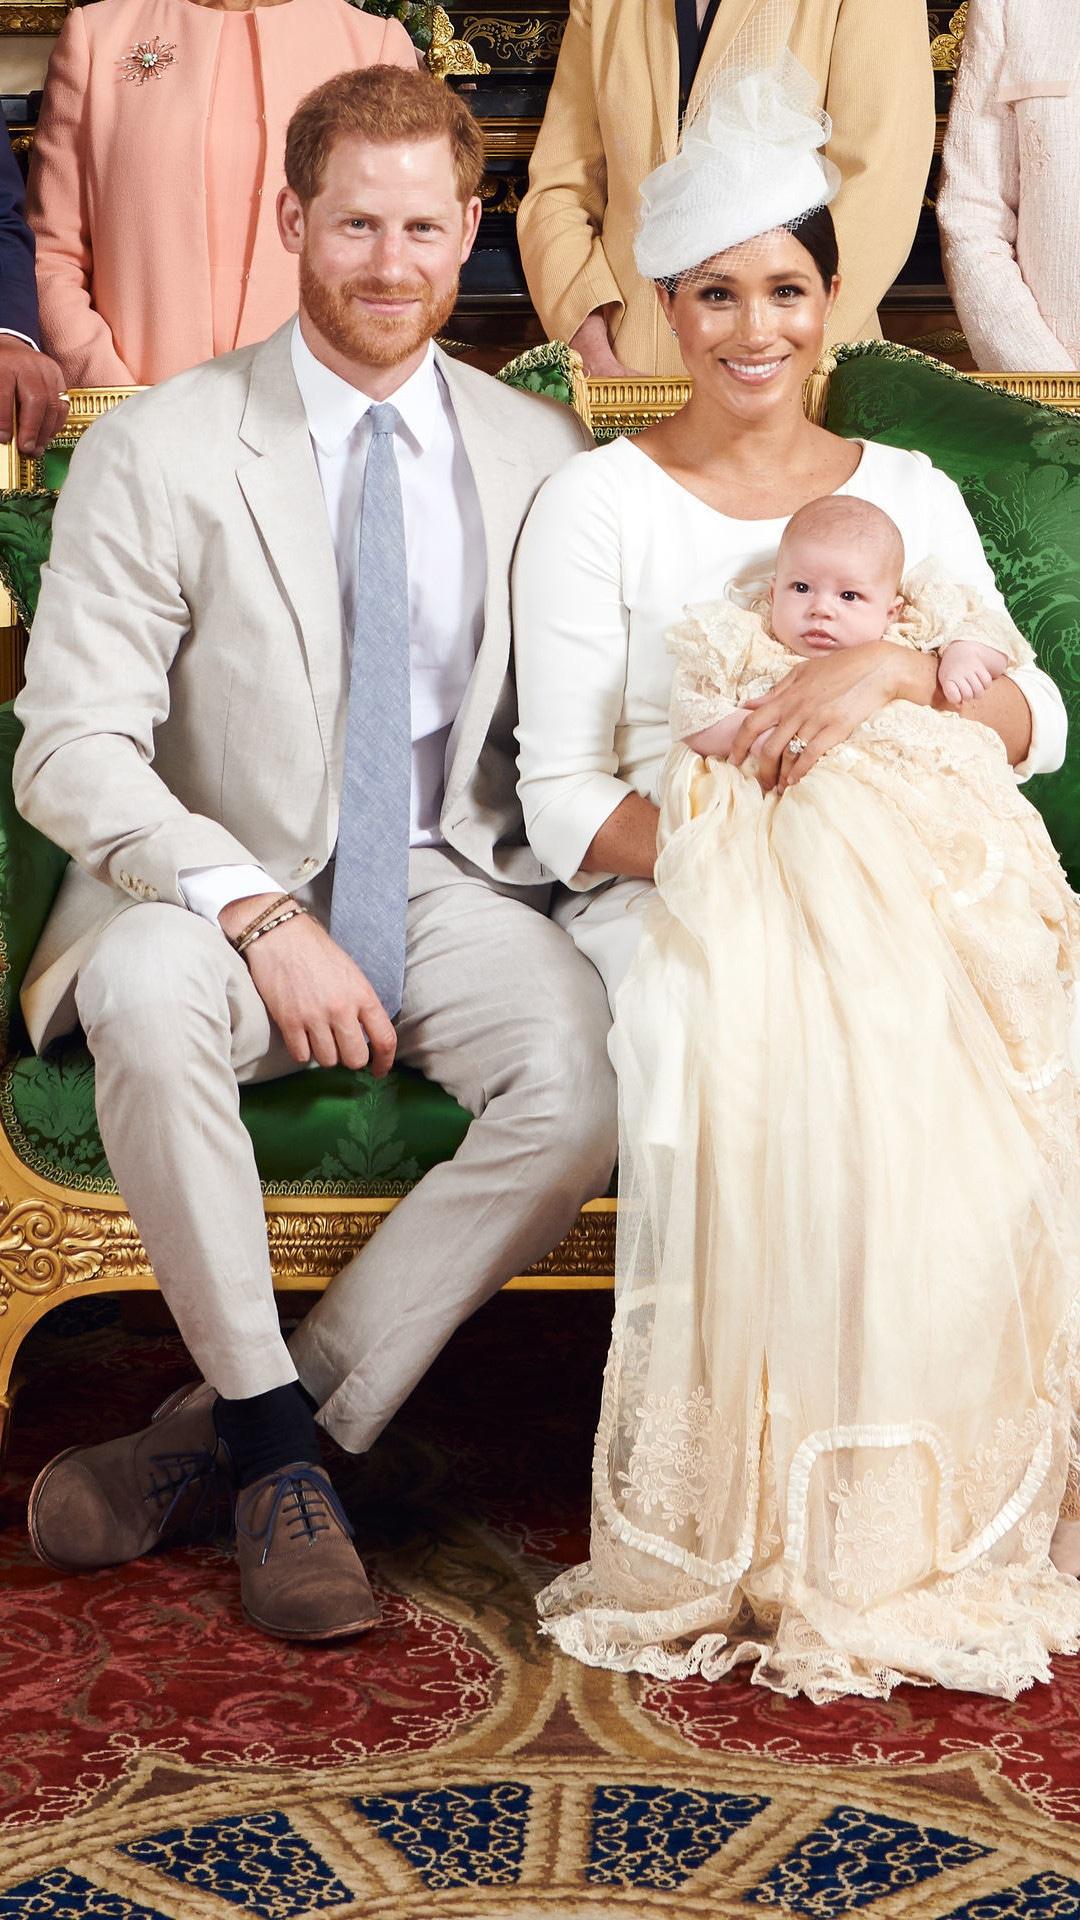 Archie, Royal Christening, Prince Harry, Prince William, Meghan Markle, Kate Middleton